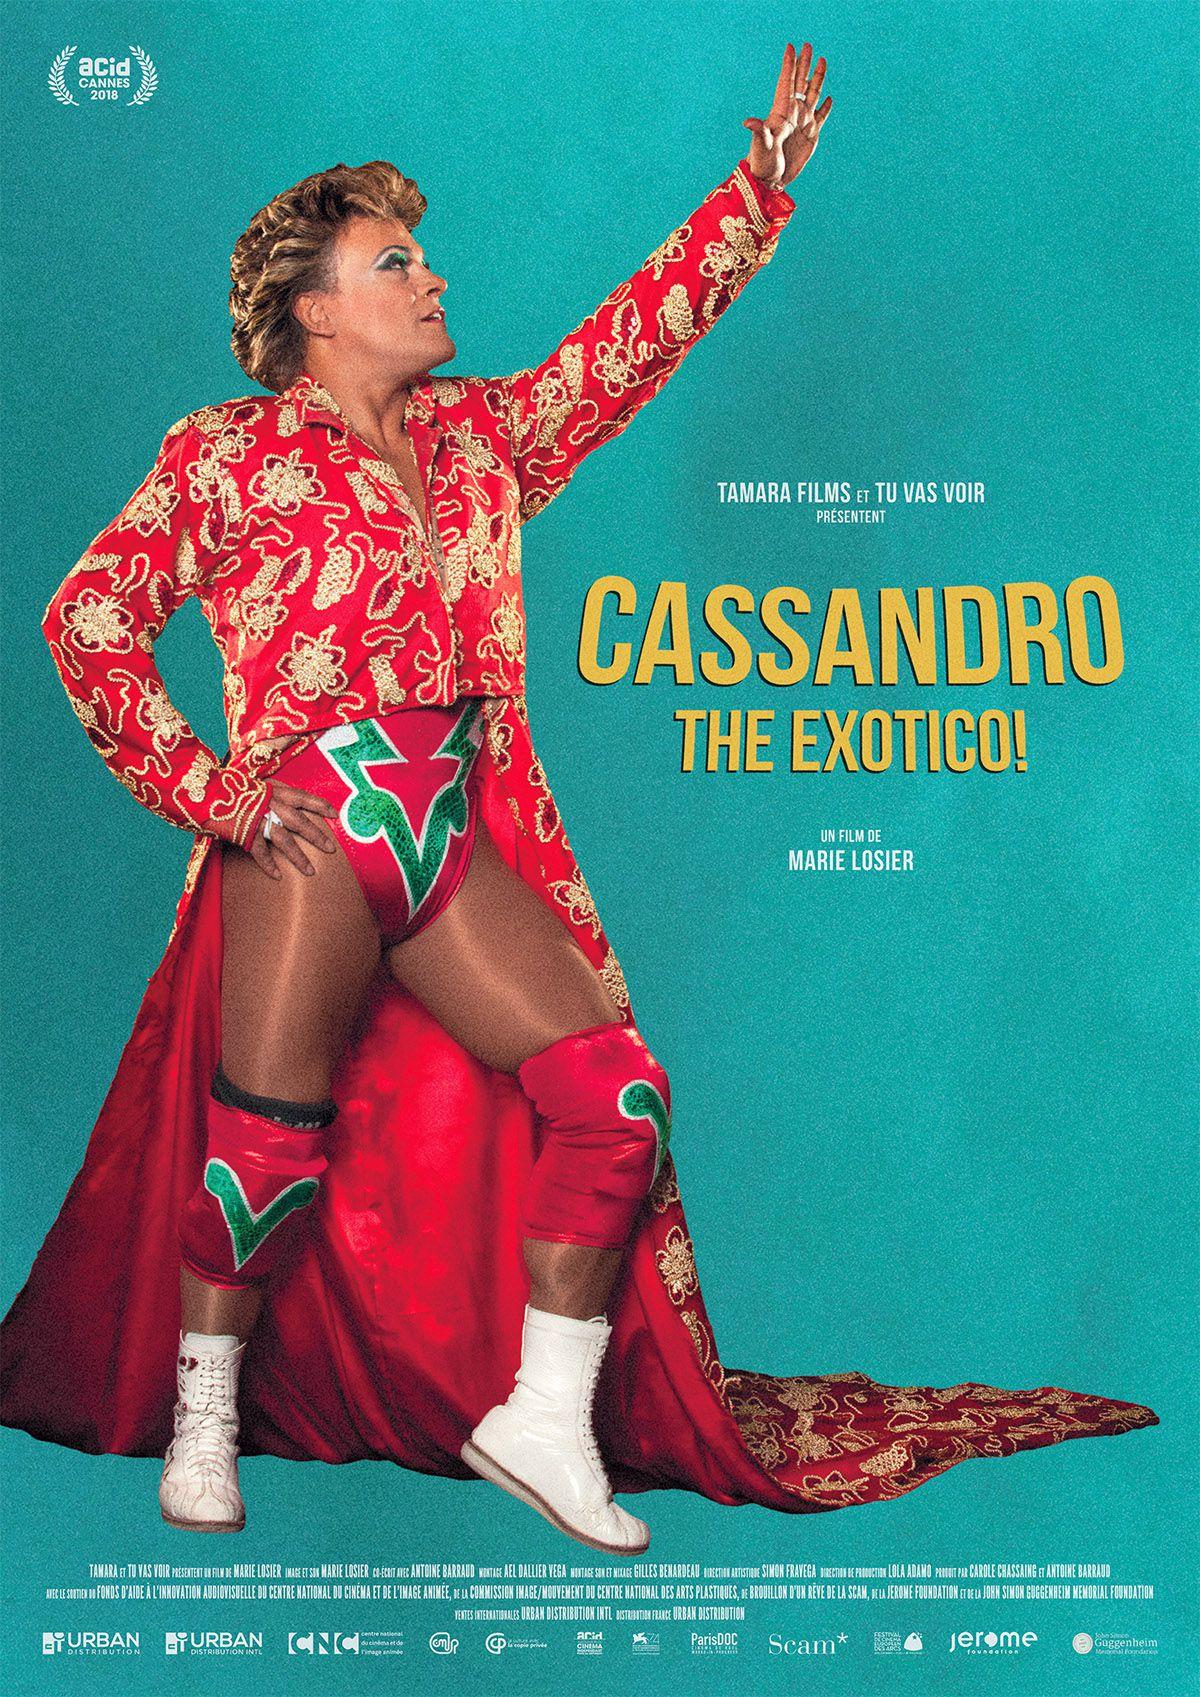 Cassandro The Exotico! - Documentaire (2018)